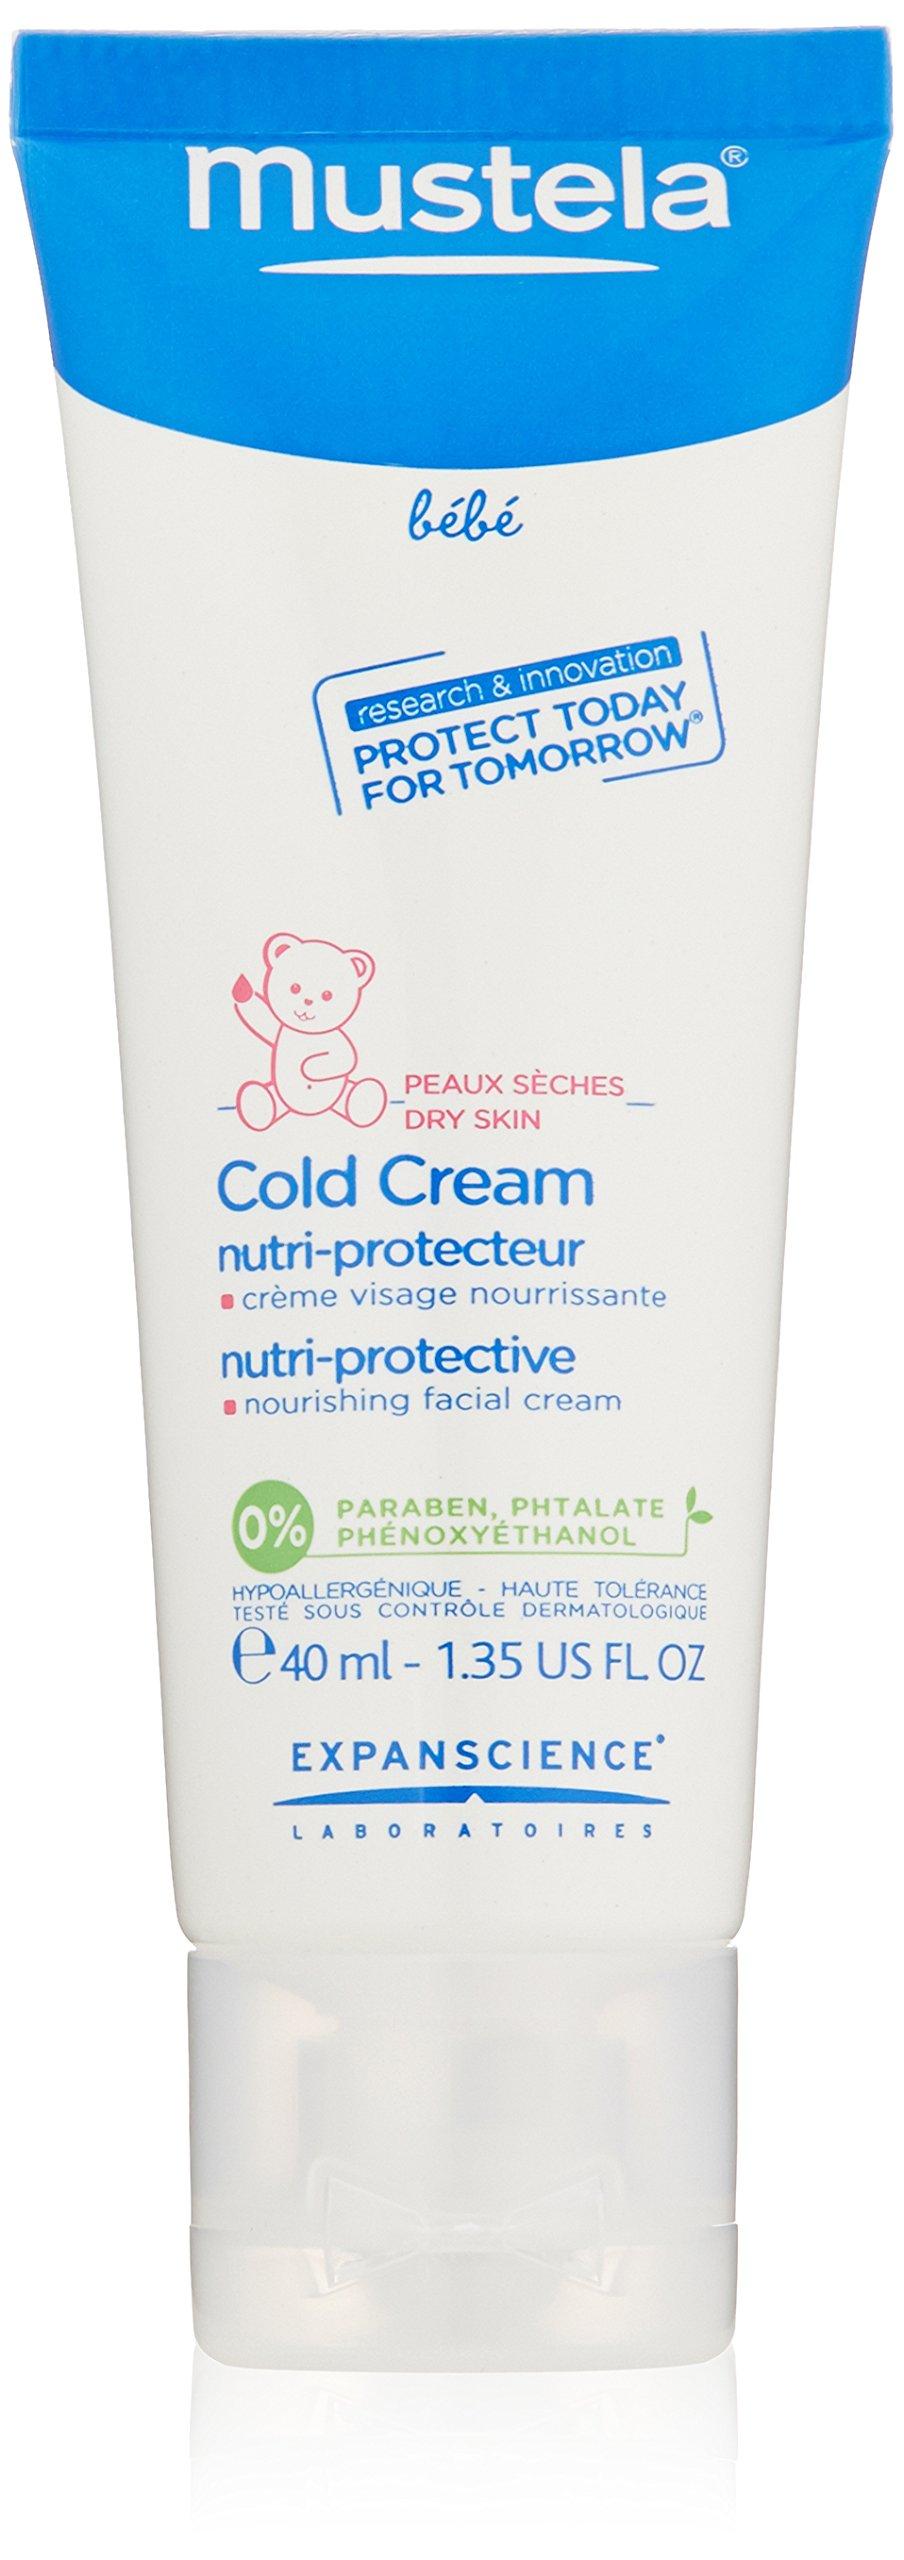 Mustela Cold Cream Nutri-protective - 1.35 US fl oz